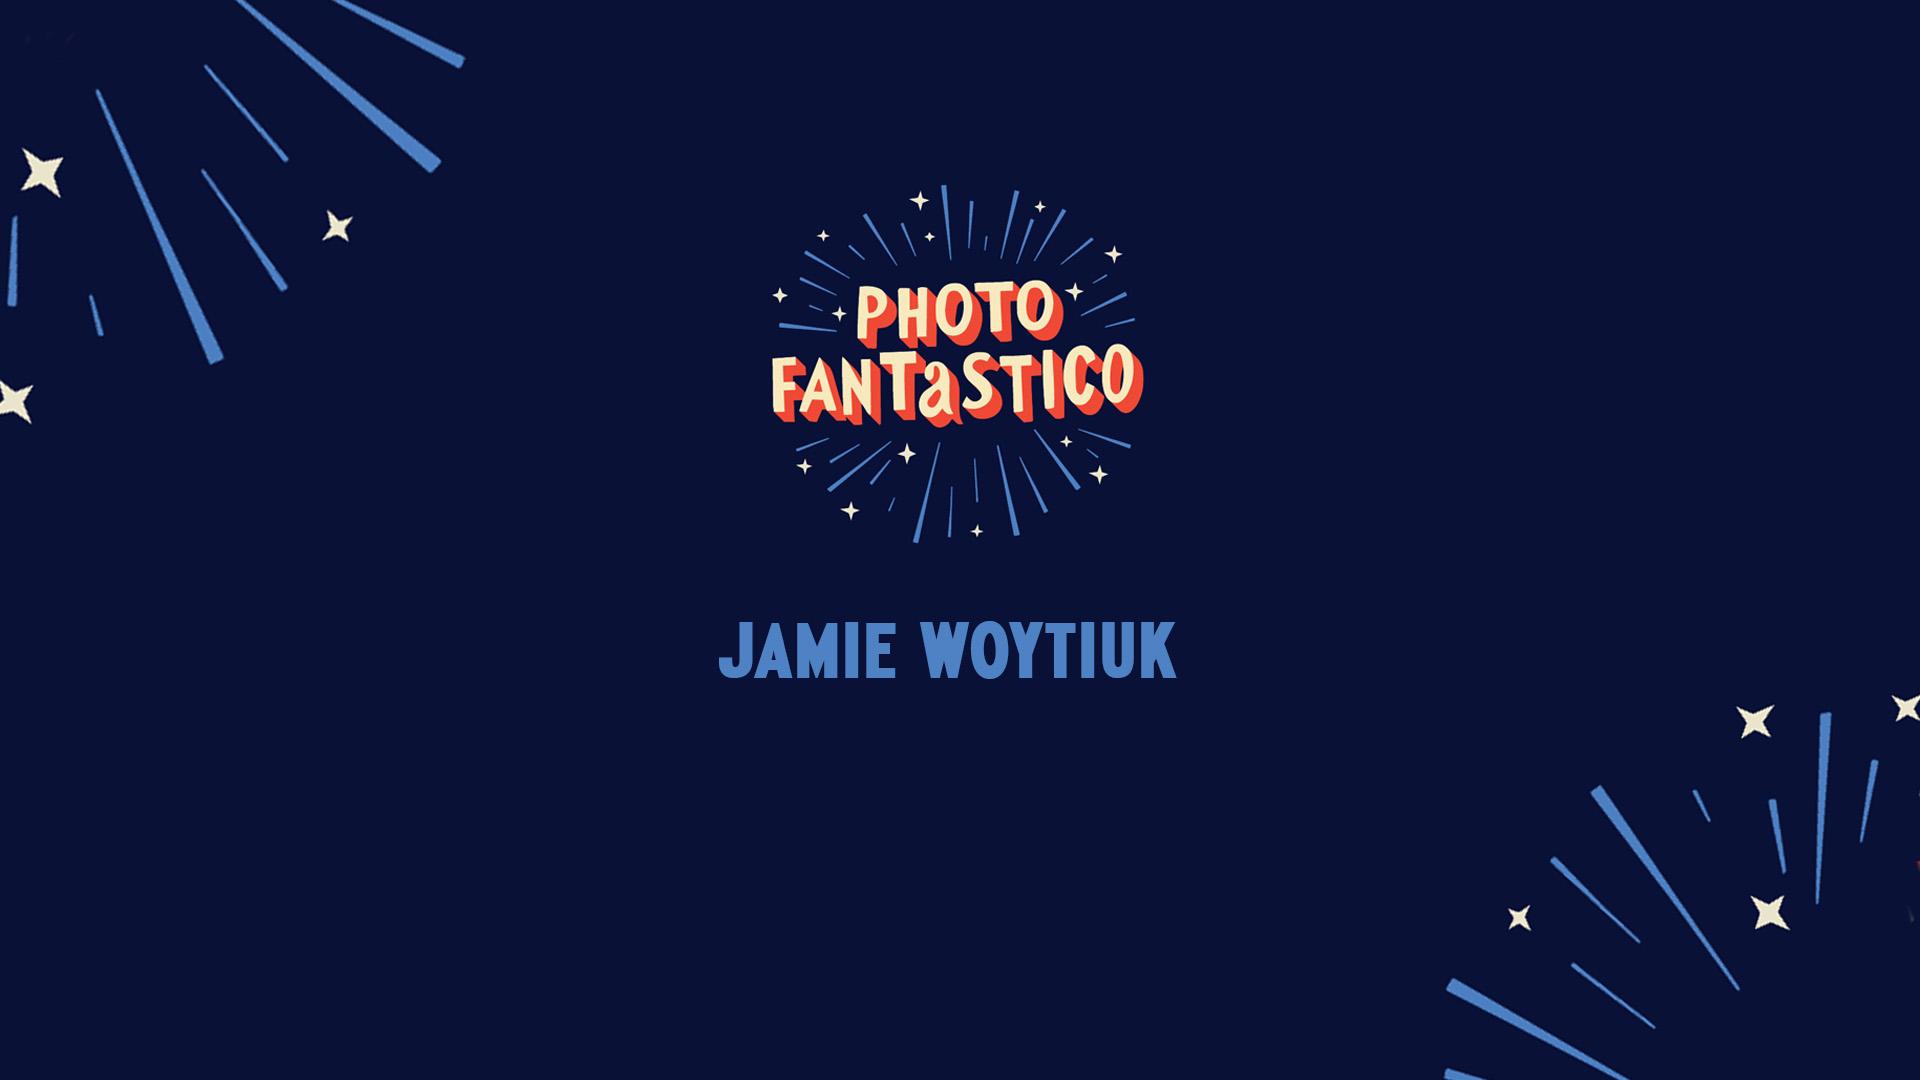 Jamie Woytiuk